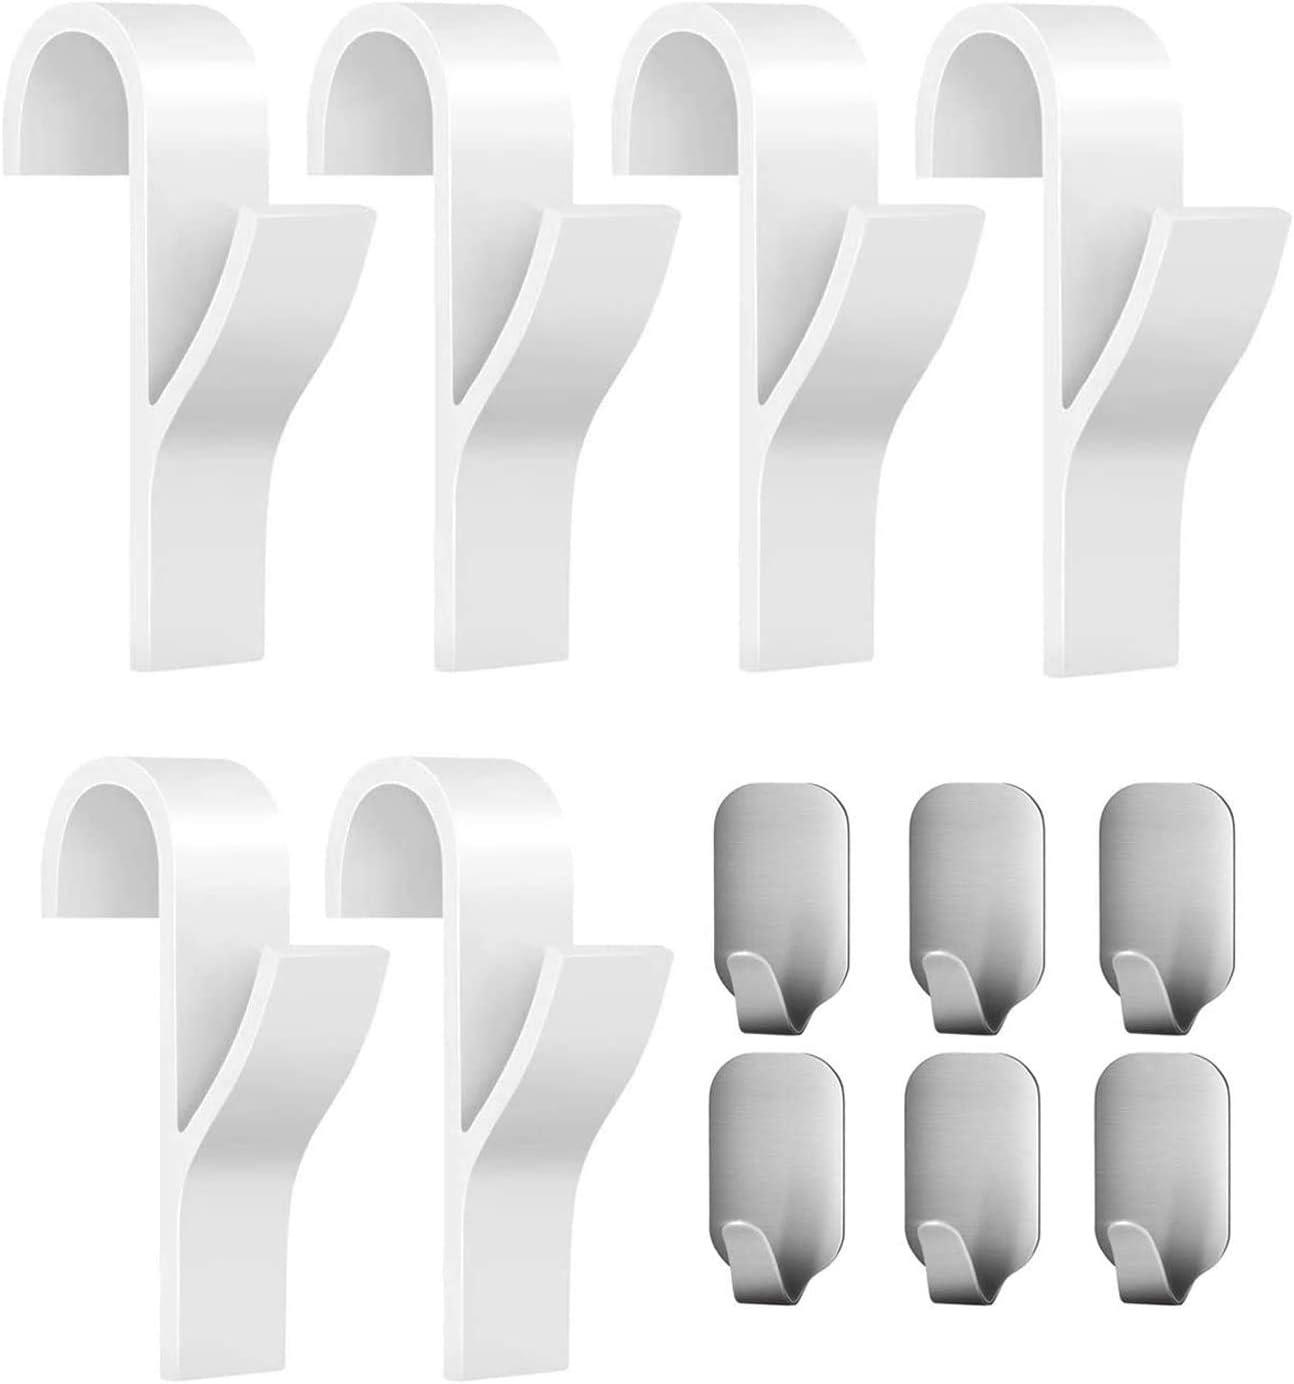 EasyULT 6 piezas Gancho para Radiador Toallero Colgadores para Radiador y 6 piezas Ganchos Adhesivos Acero Inoxidable, para Baño e Cocina(12 Piezas)